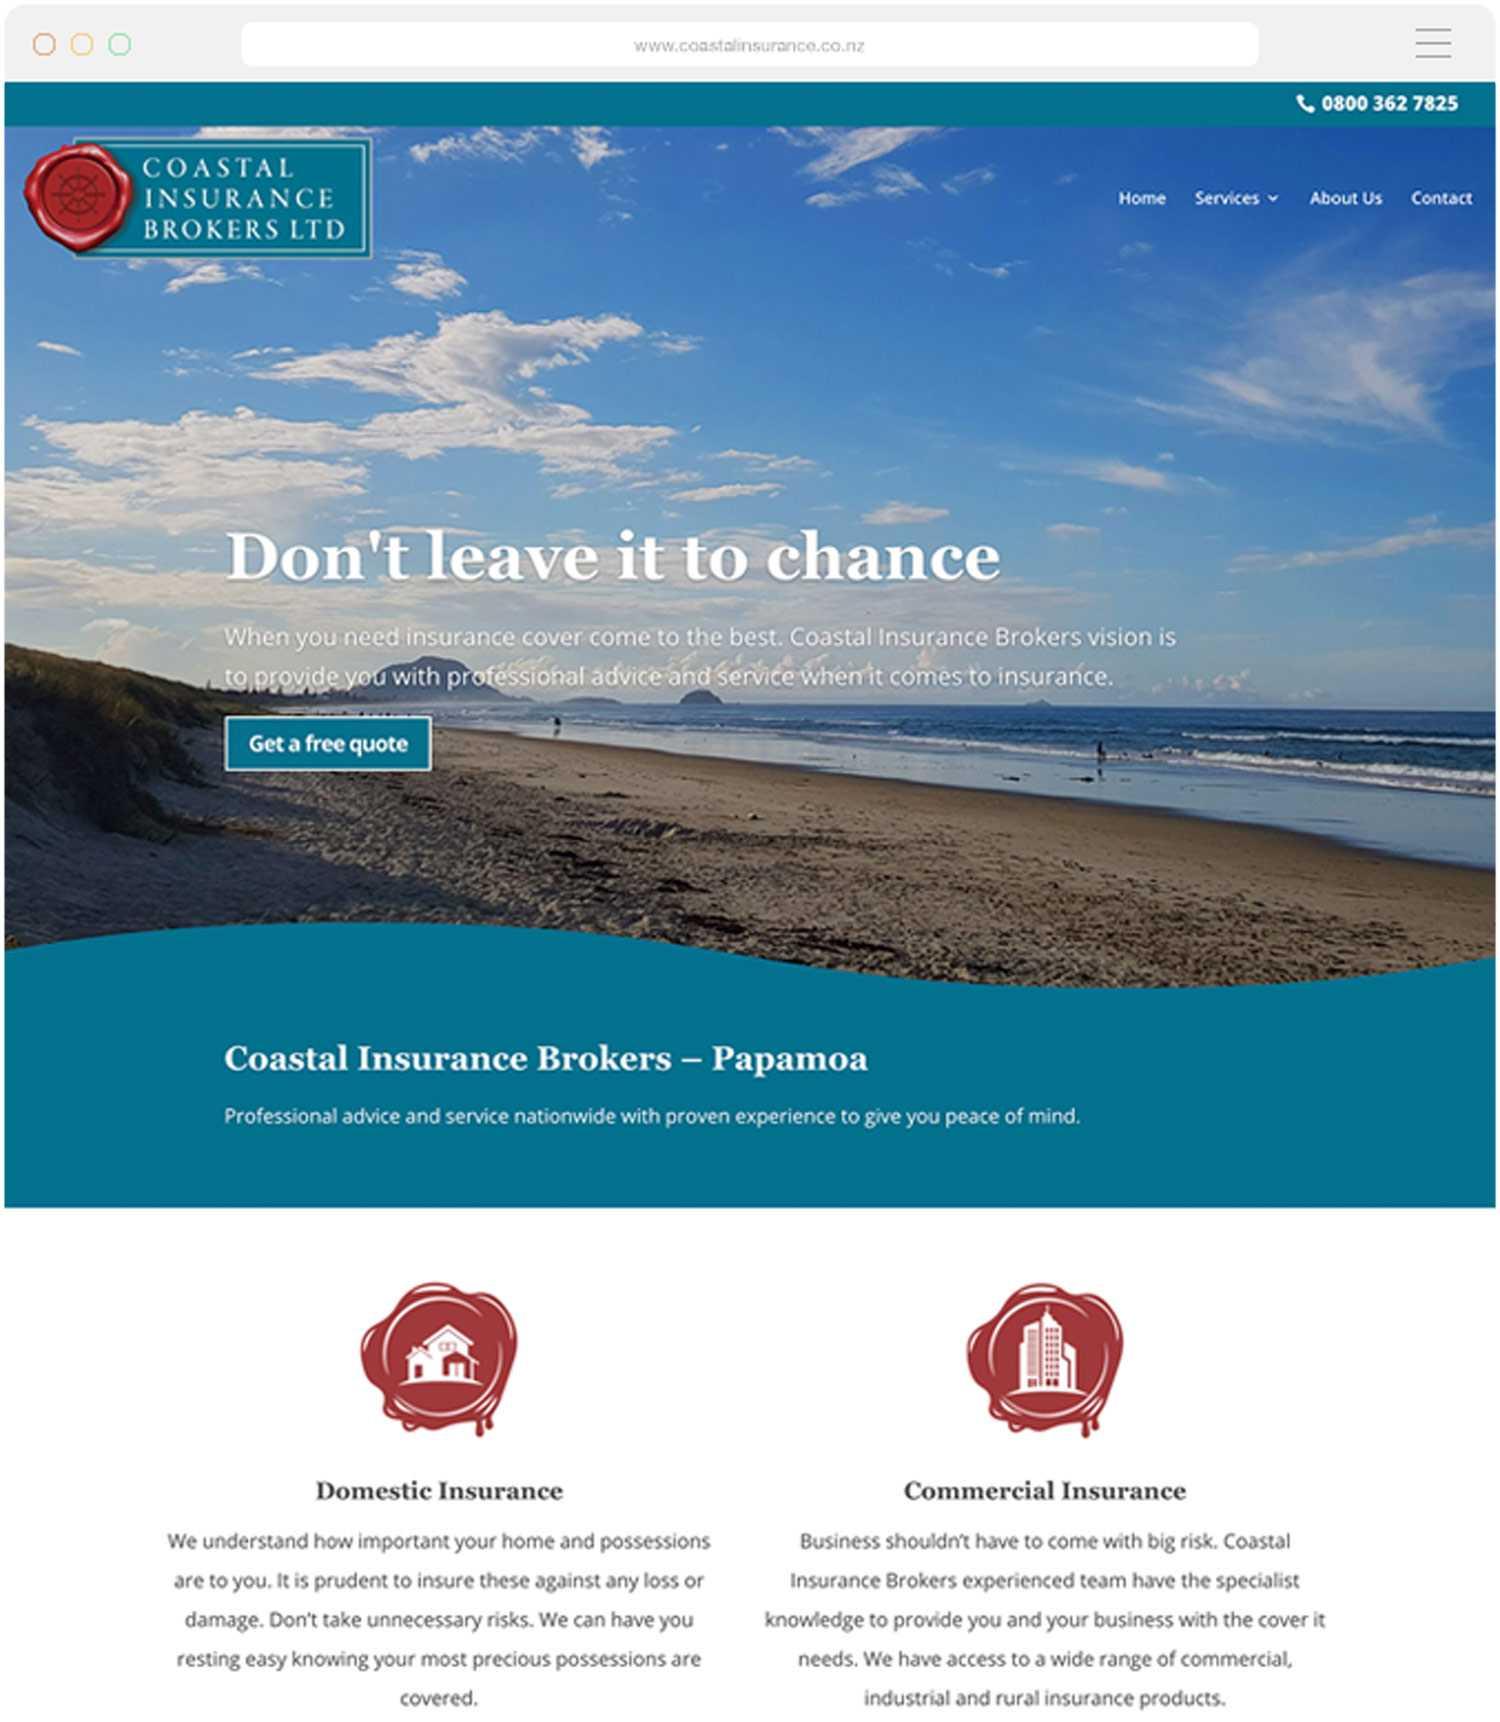 Website build for Coastal Insurance Brokers